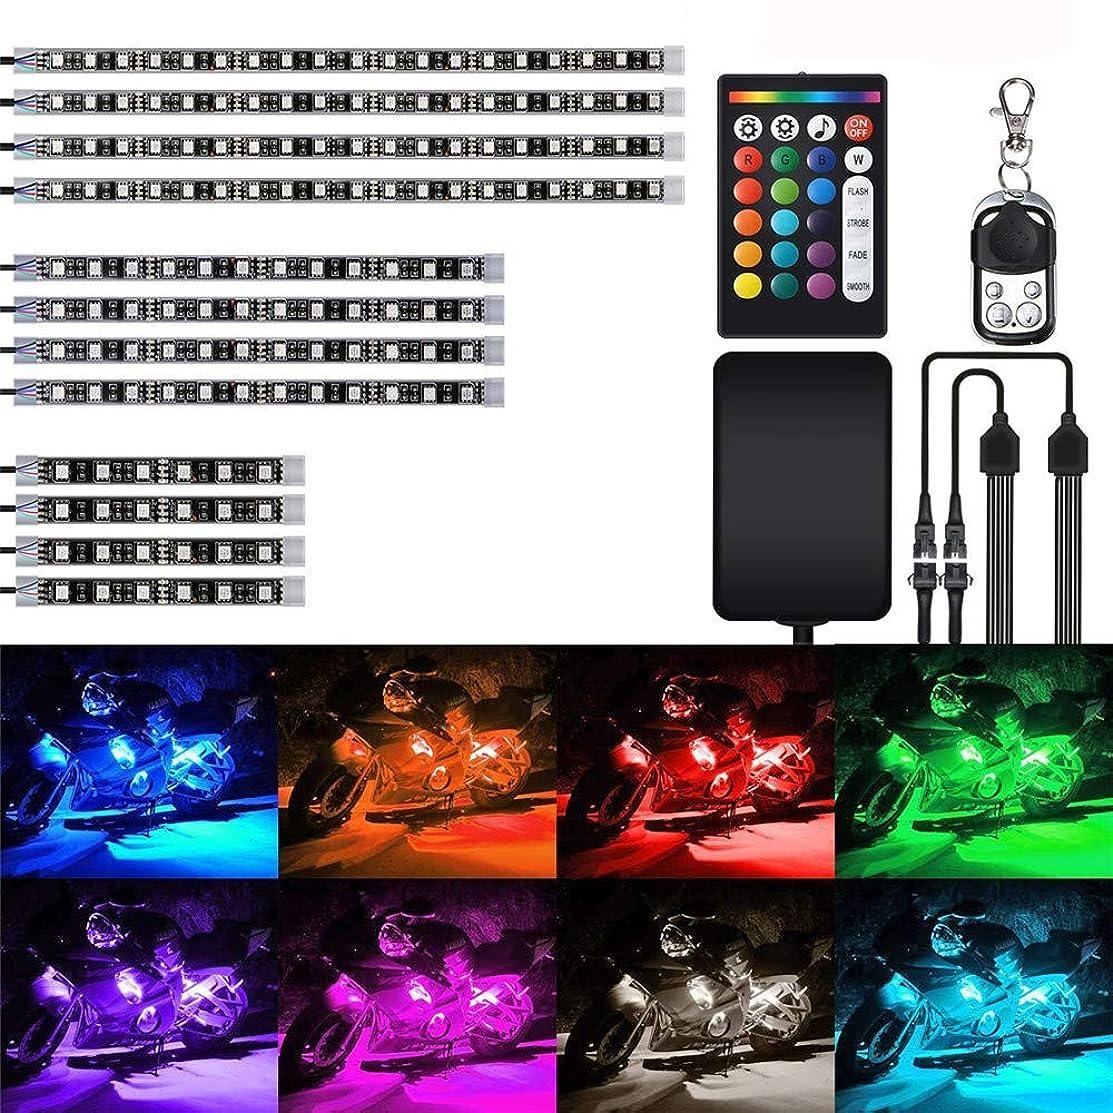 RISHIL WORLD 12Pcs 18Color RGB LED Effect Decoration Lights Kit Voice Remote Control for Car Motorcycle